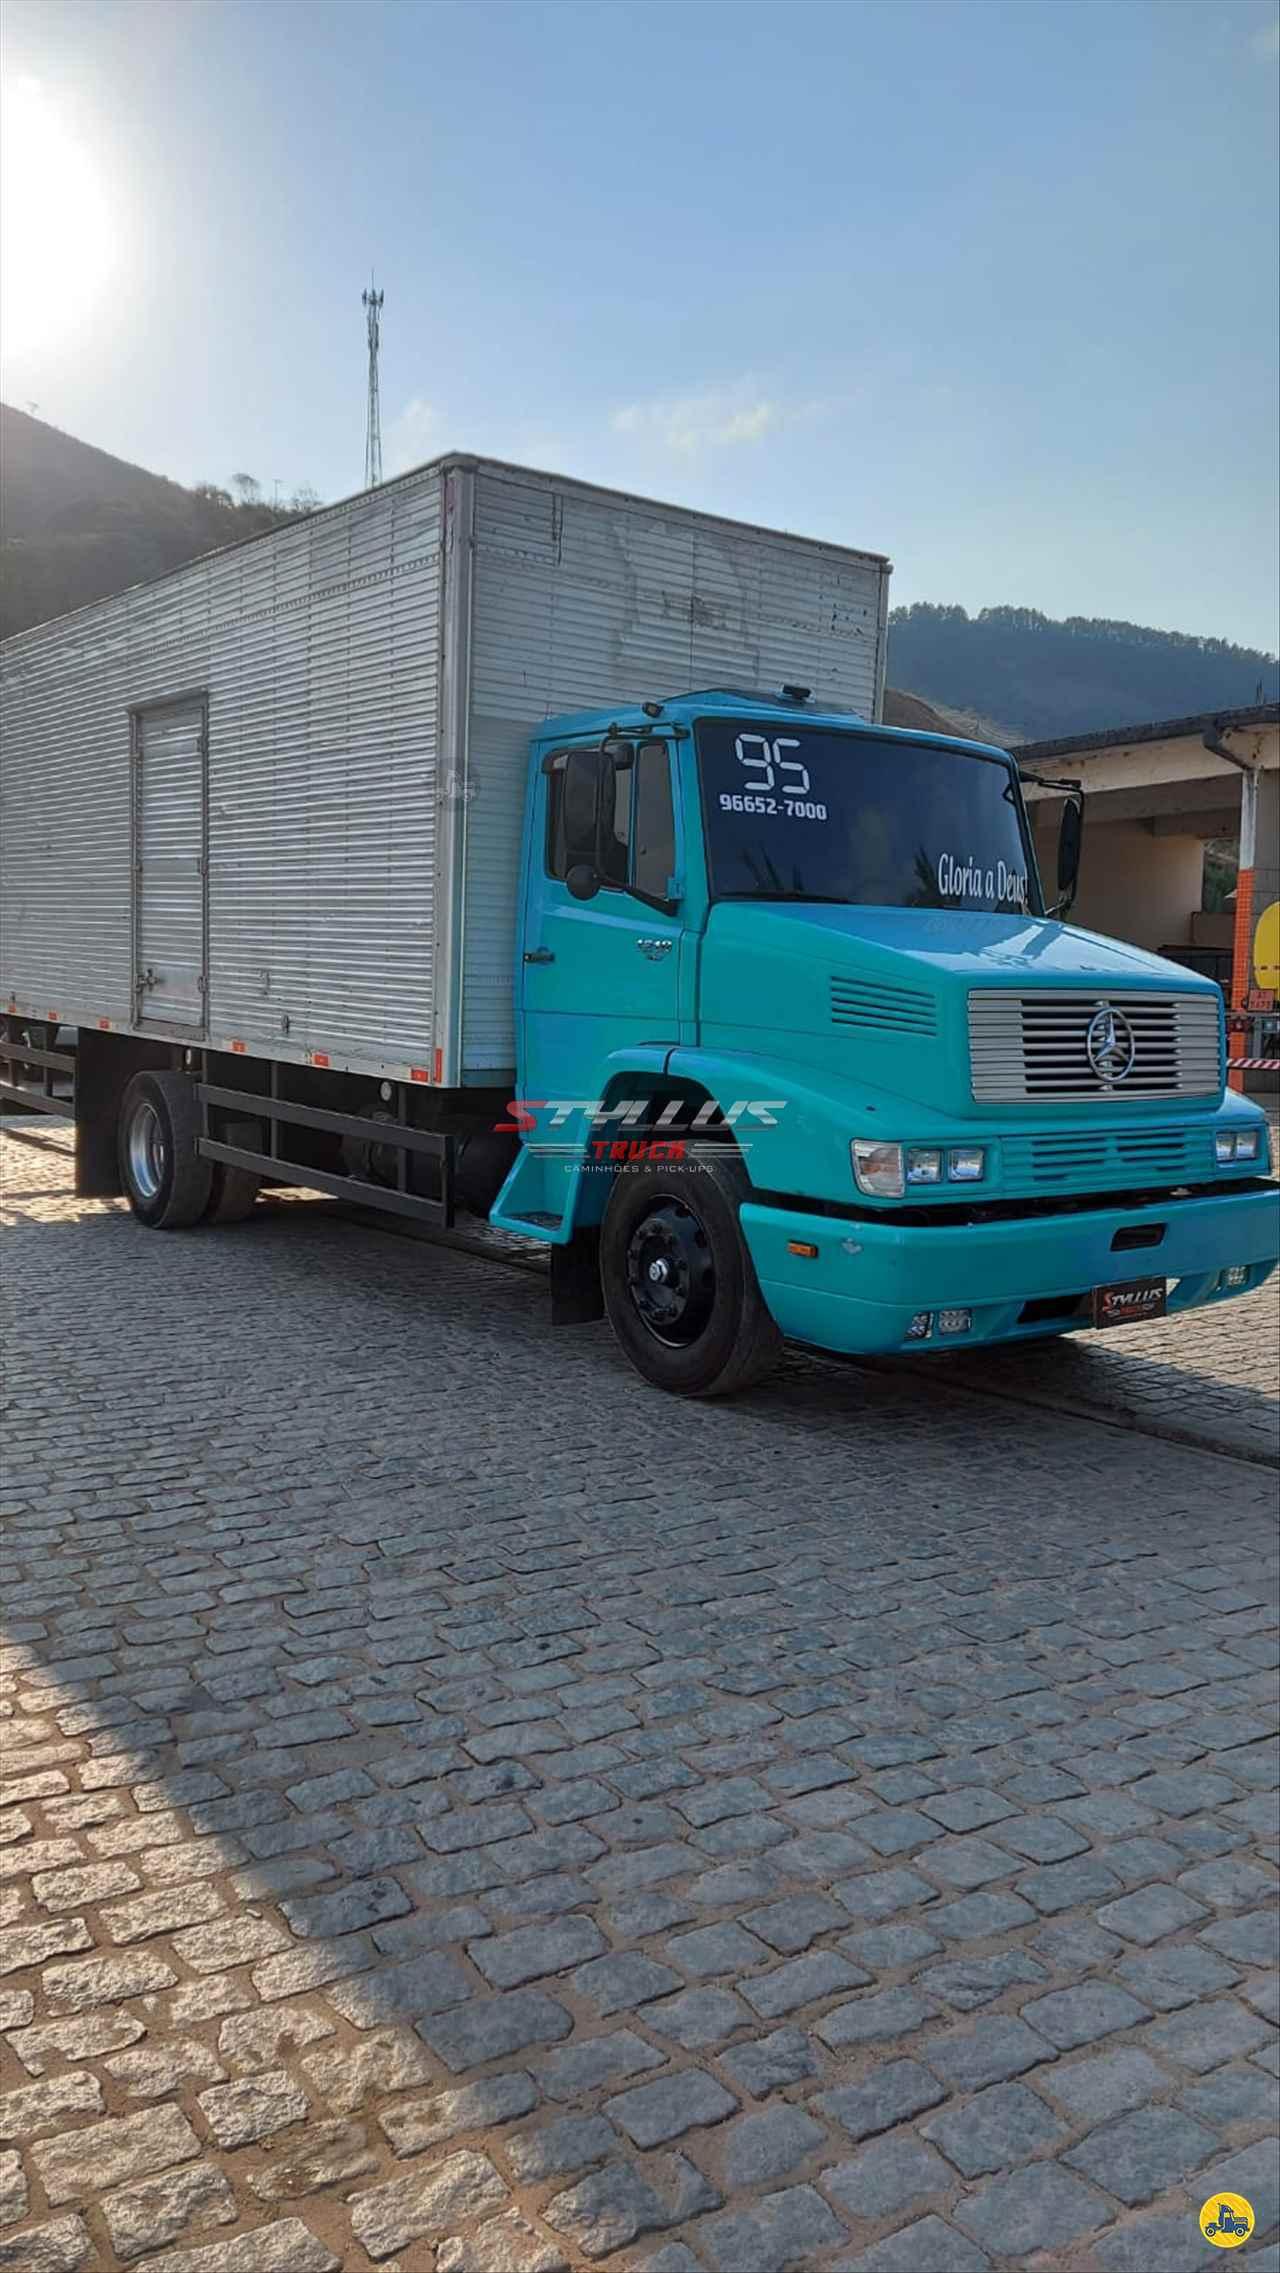 MB 1218 de Styllus Truck - TERESOPOLIS/RJ